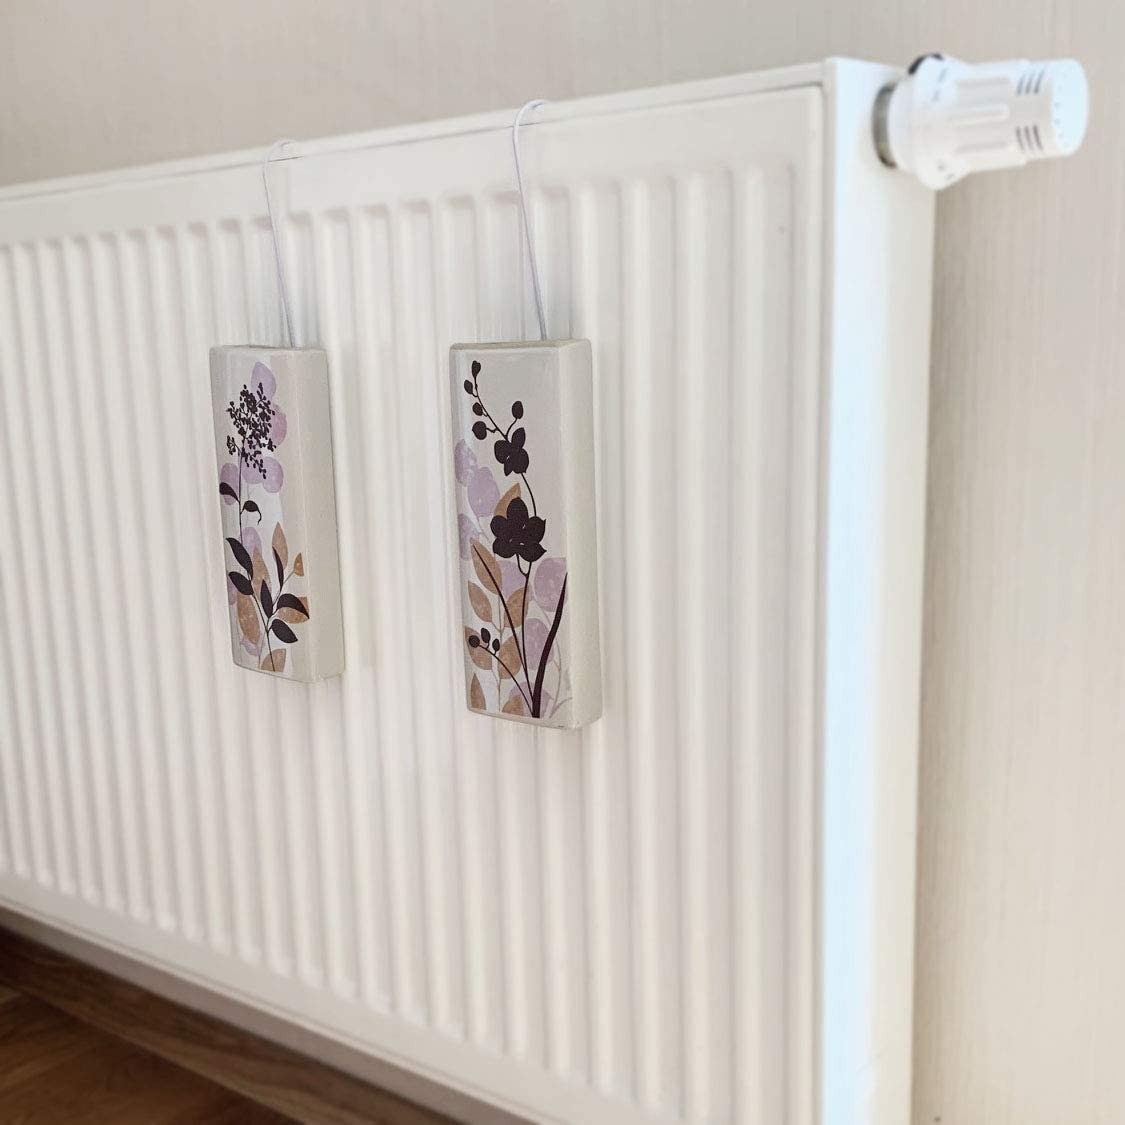 Set di 4 umidificatori in ceramica Ikea Bana a1662 da fissare al termosifone